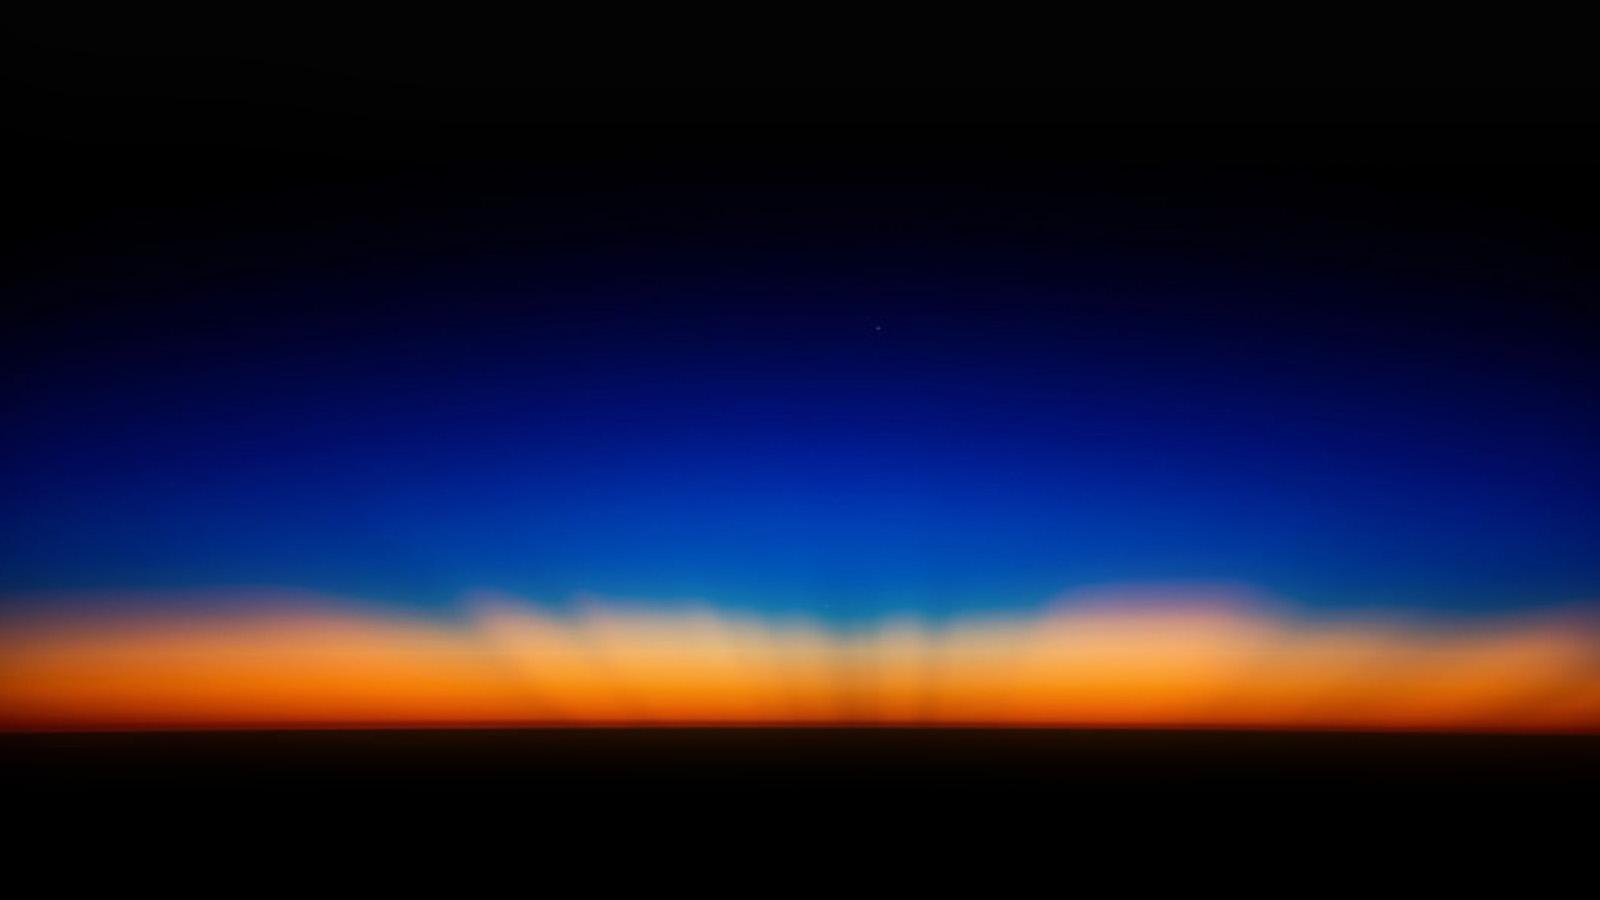 sk35-sunset-dark-red-blue-horizontal-blur-gradation-wallpaper